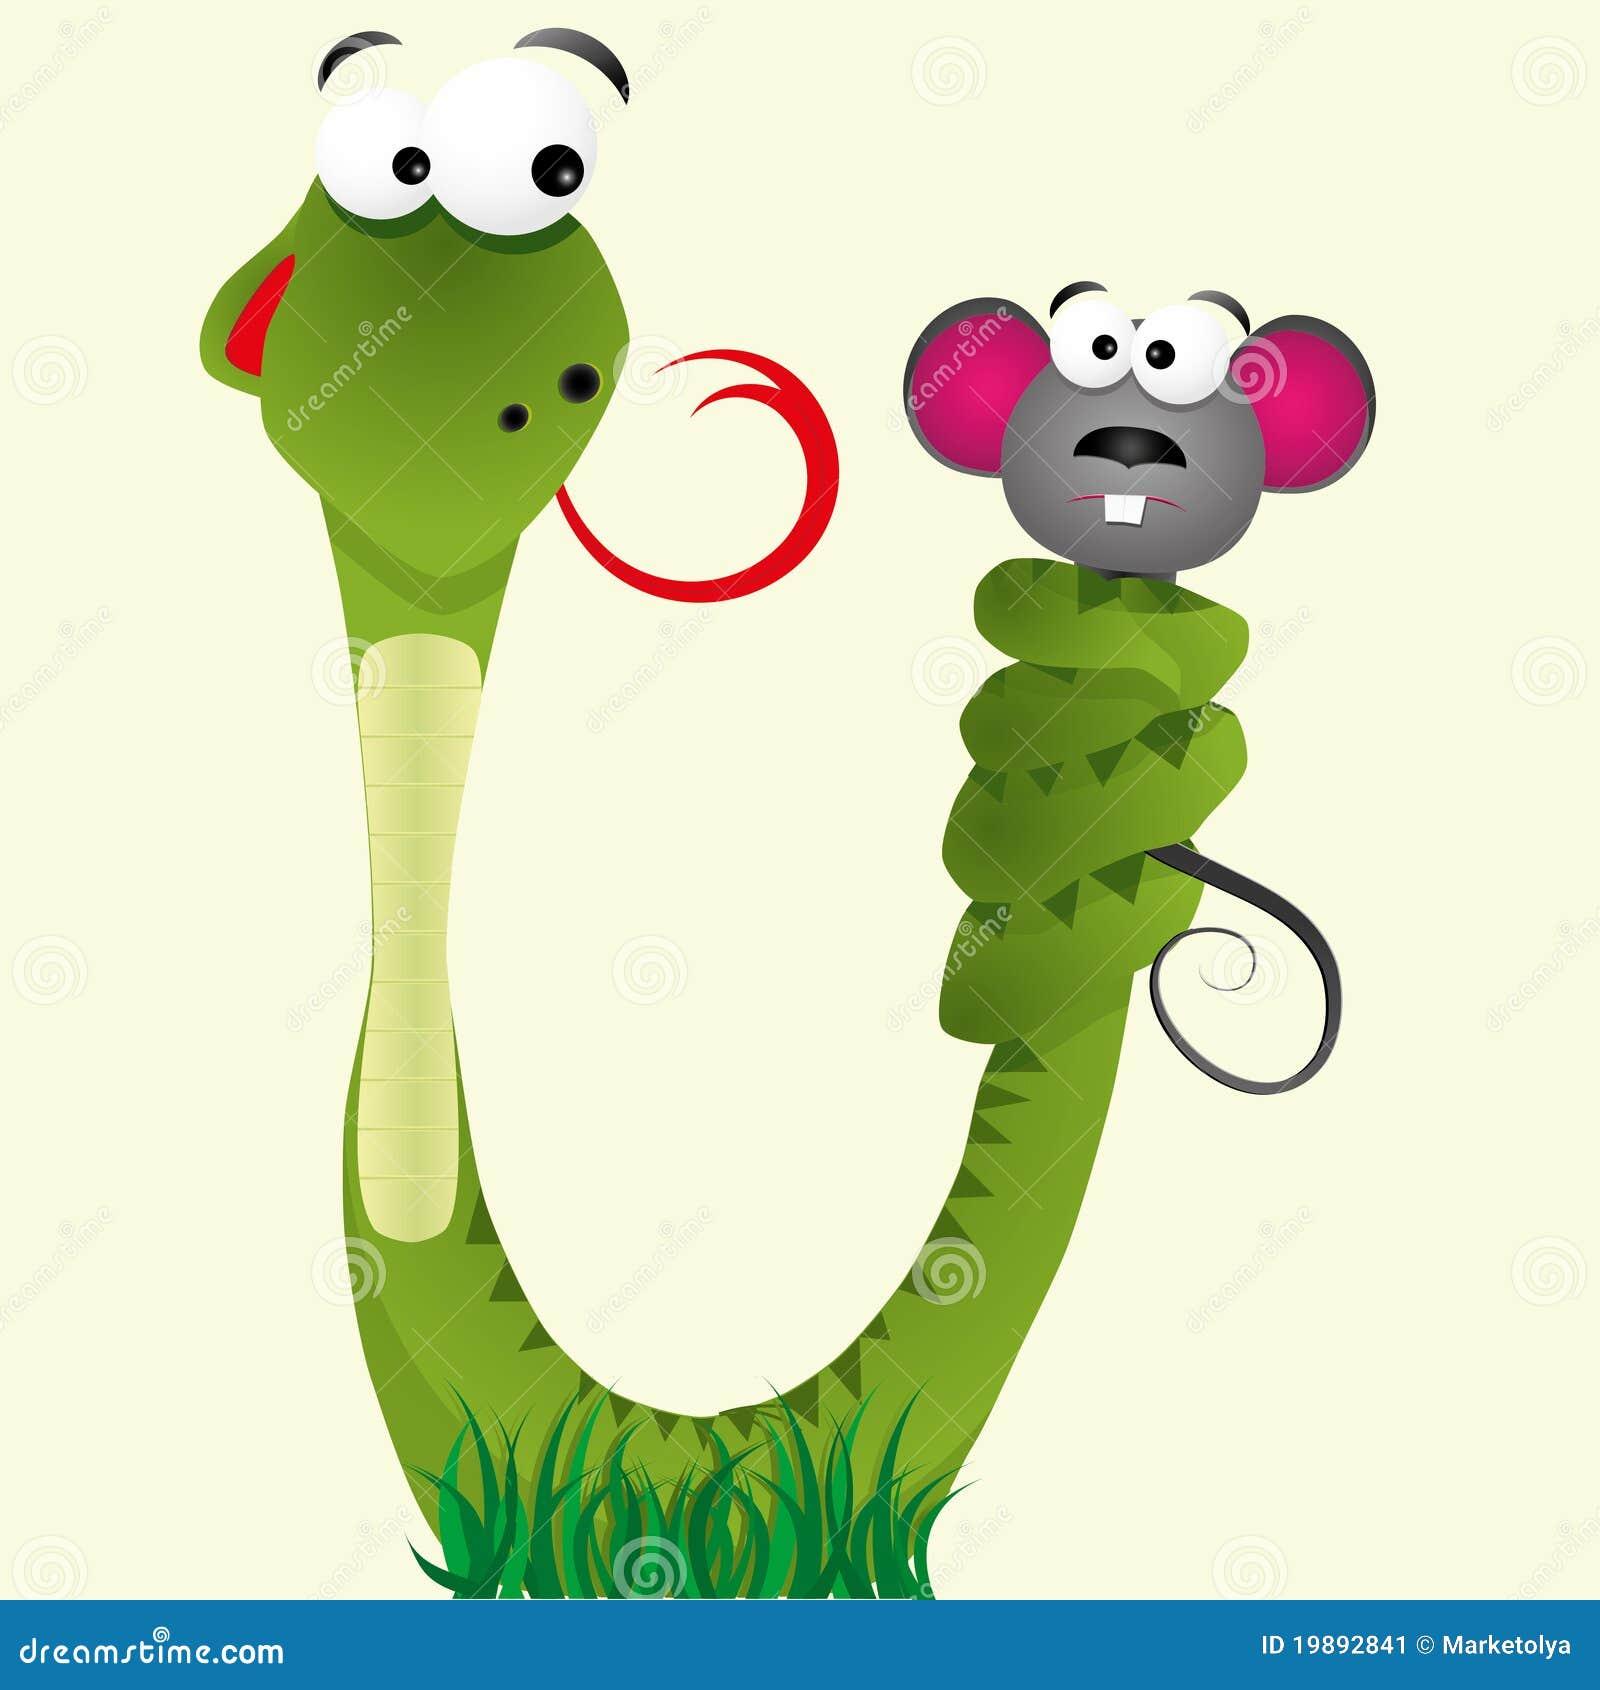 Green snake cartoon royalty free stock image image 19462406 - Serpente E Bocca Immagine Stock